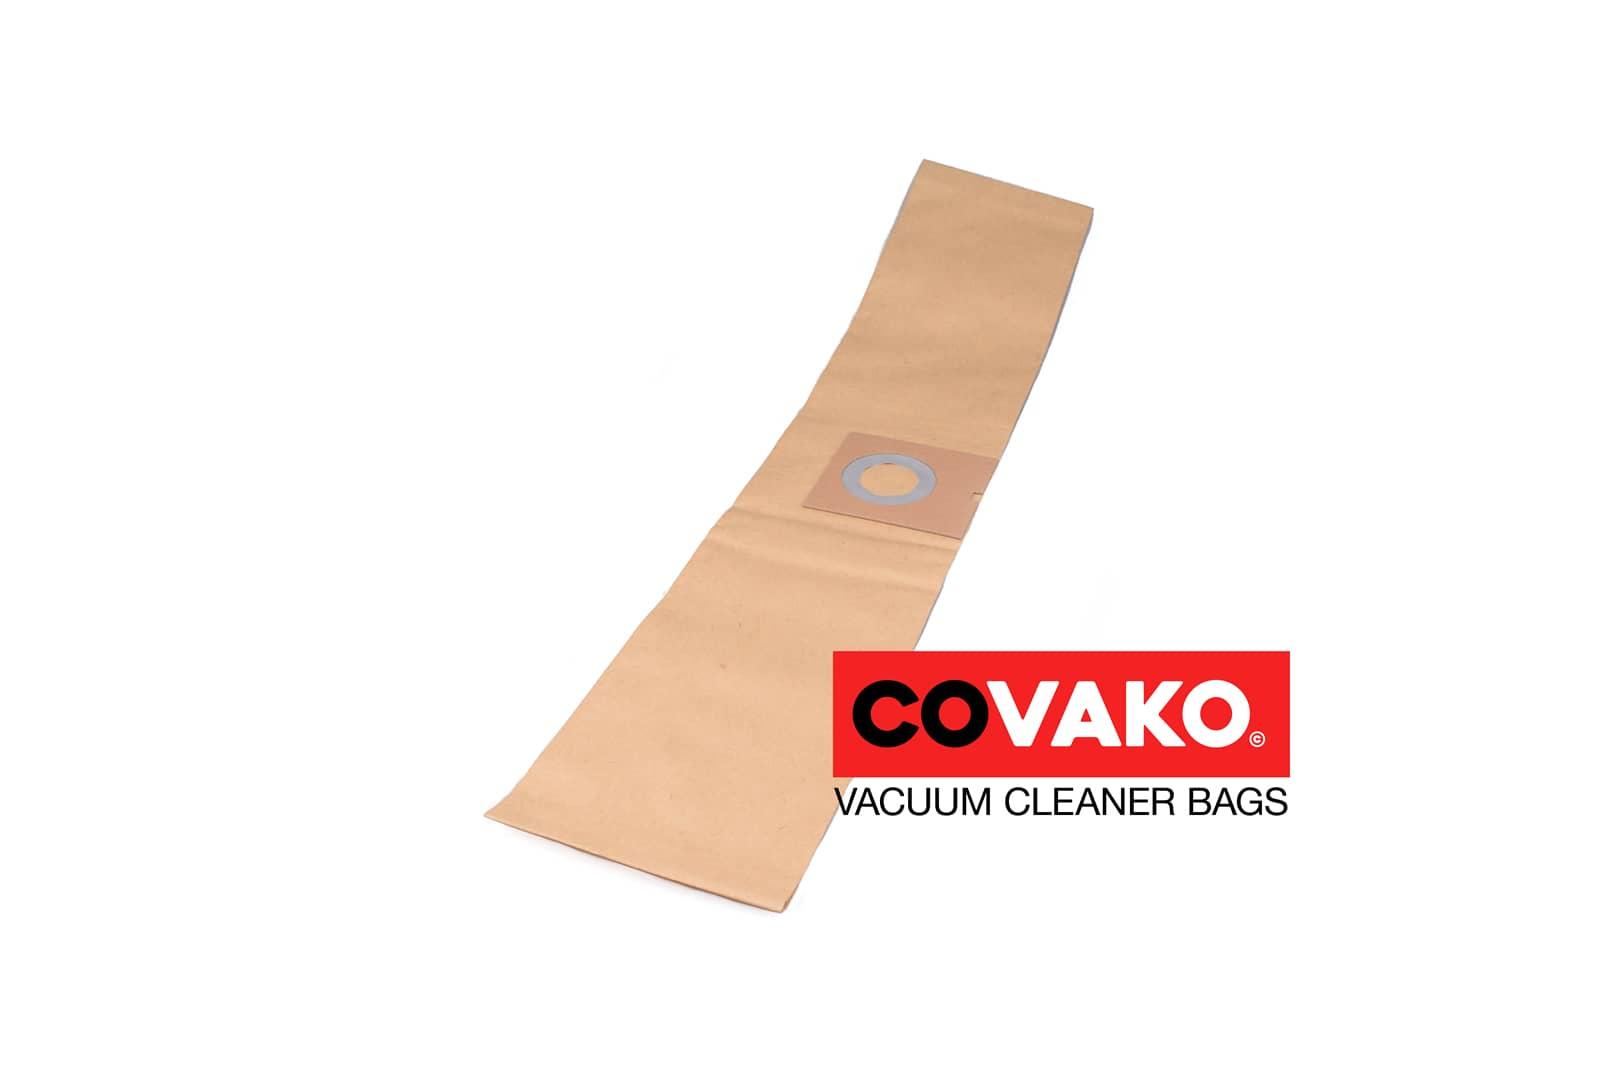 Kärcher T 101 / Papier - Kärcher sacs d'aspirateur